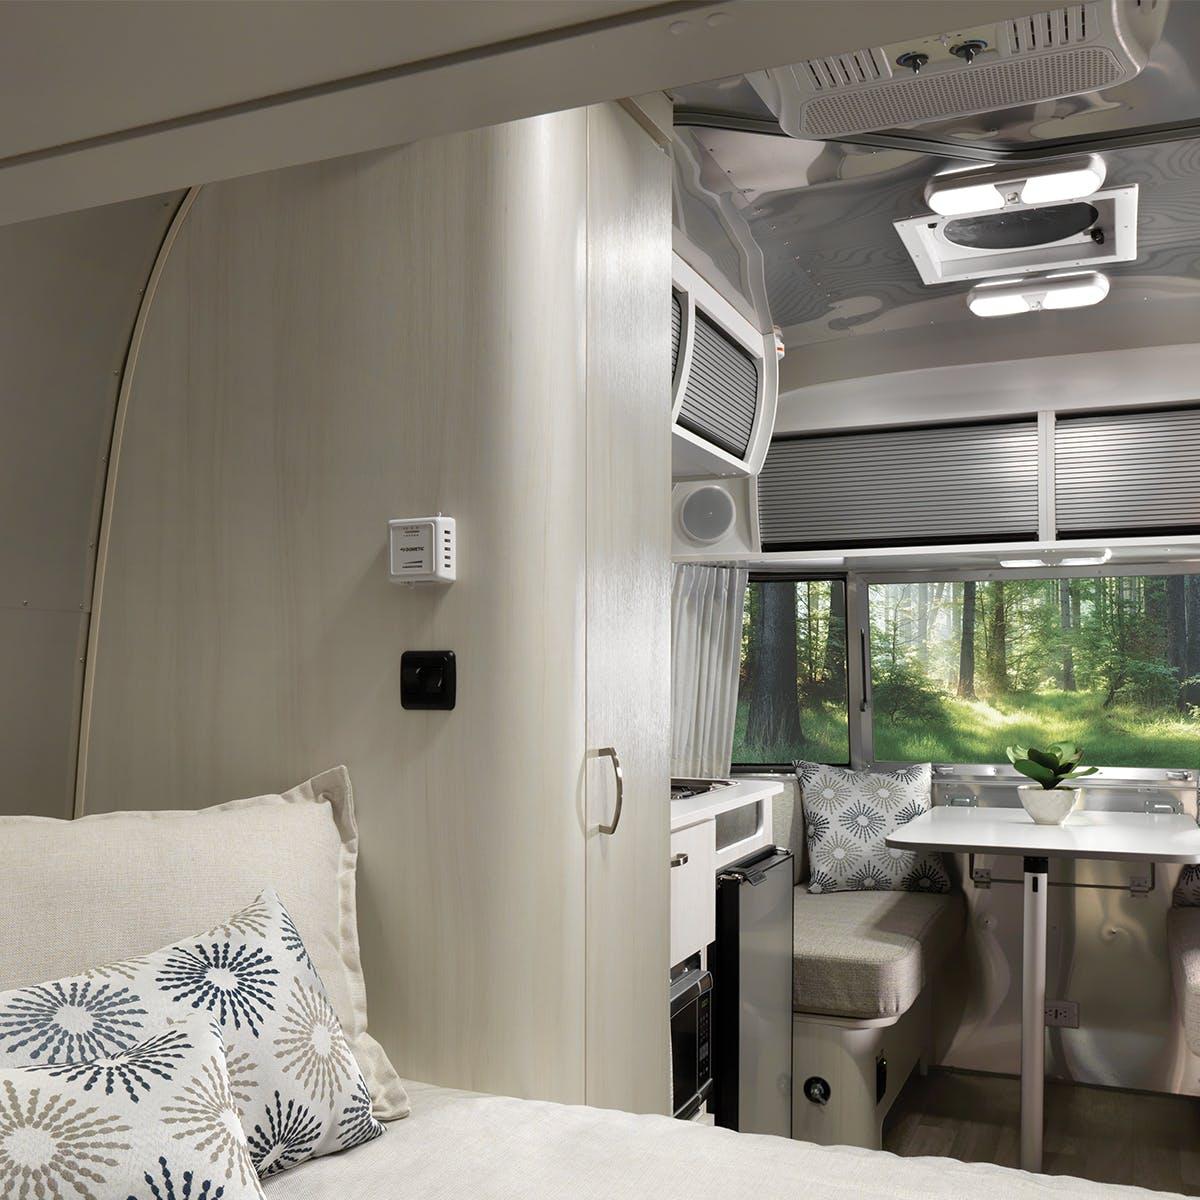 2020 Airstream Bambi Travel Trailer Interior Storage